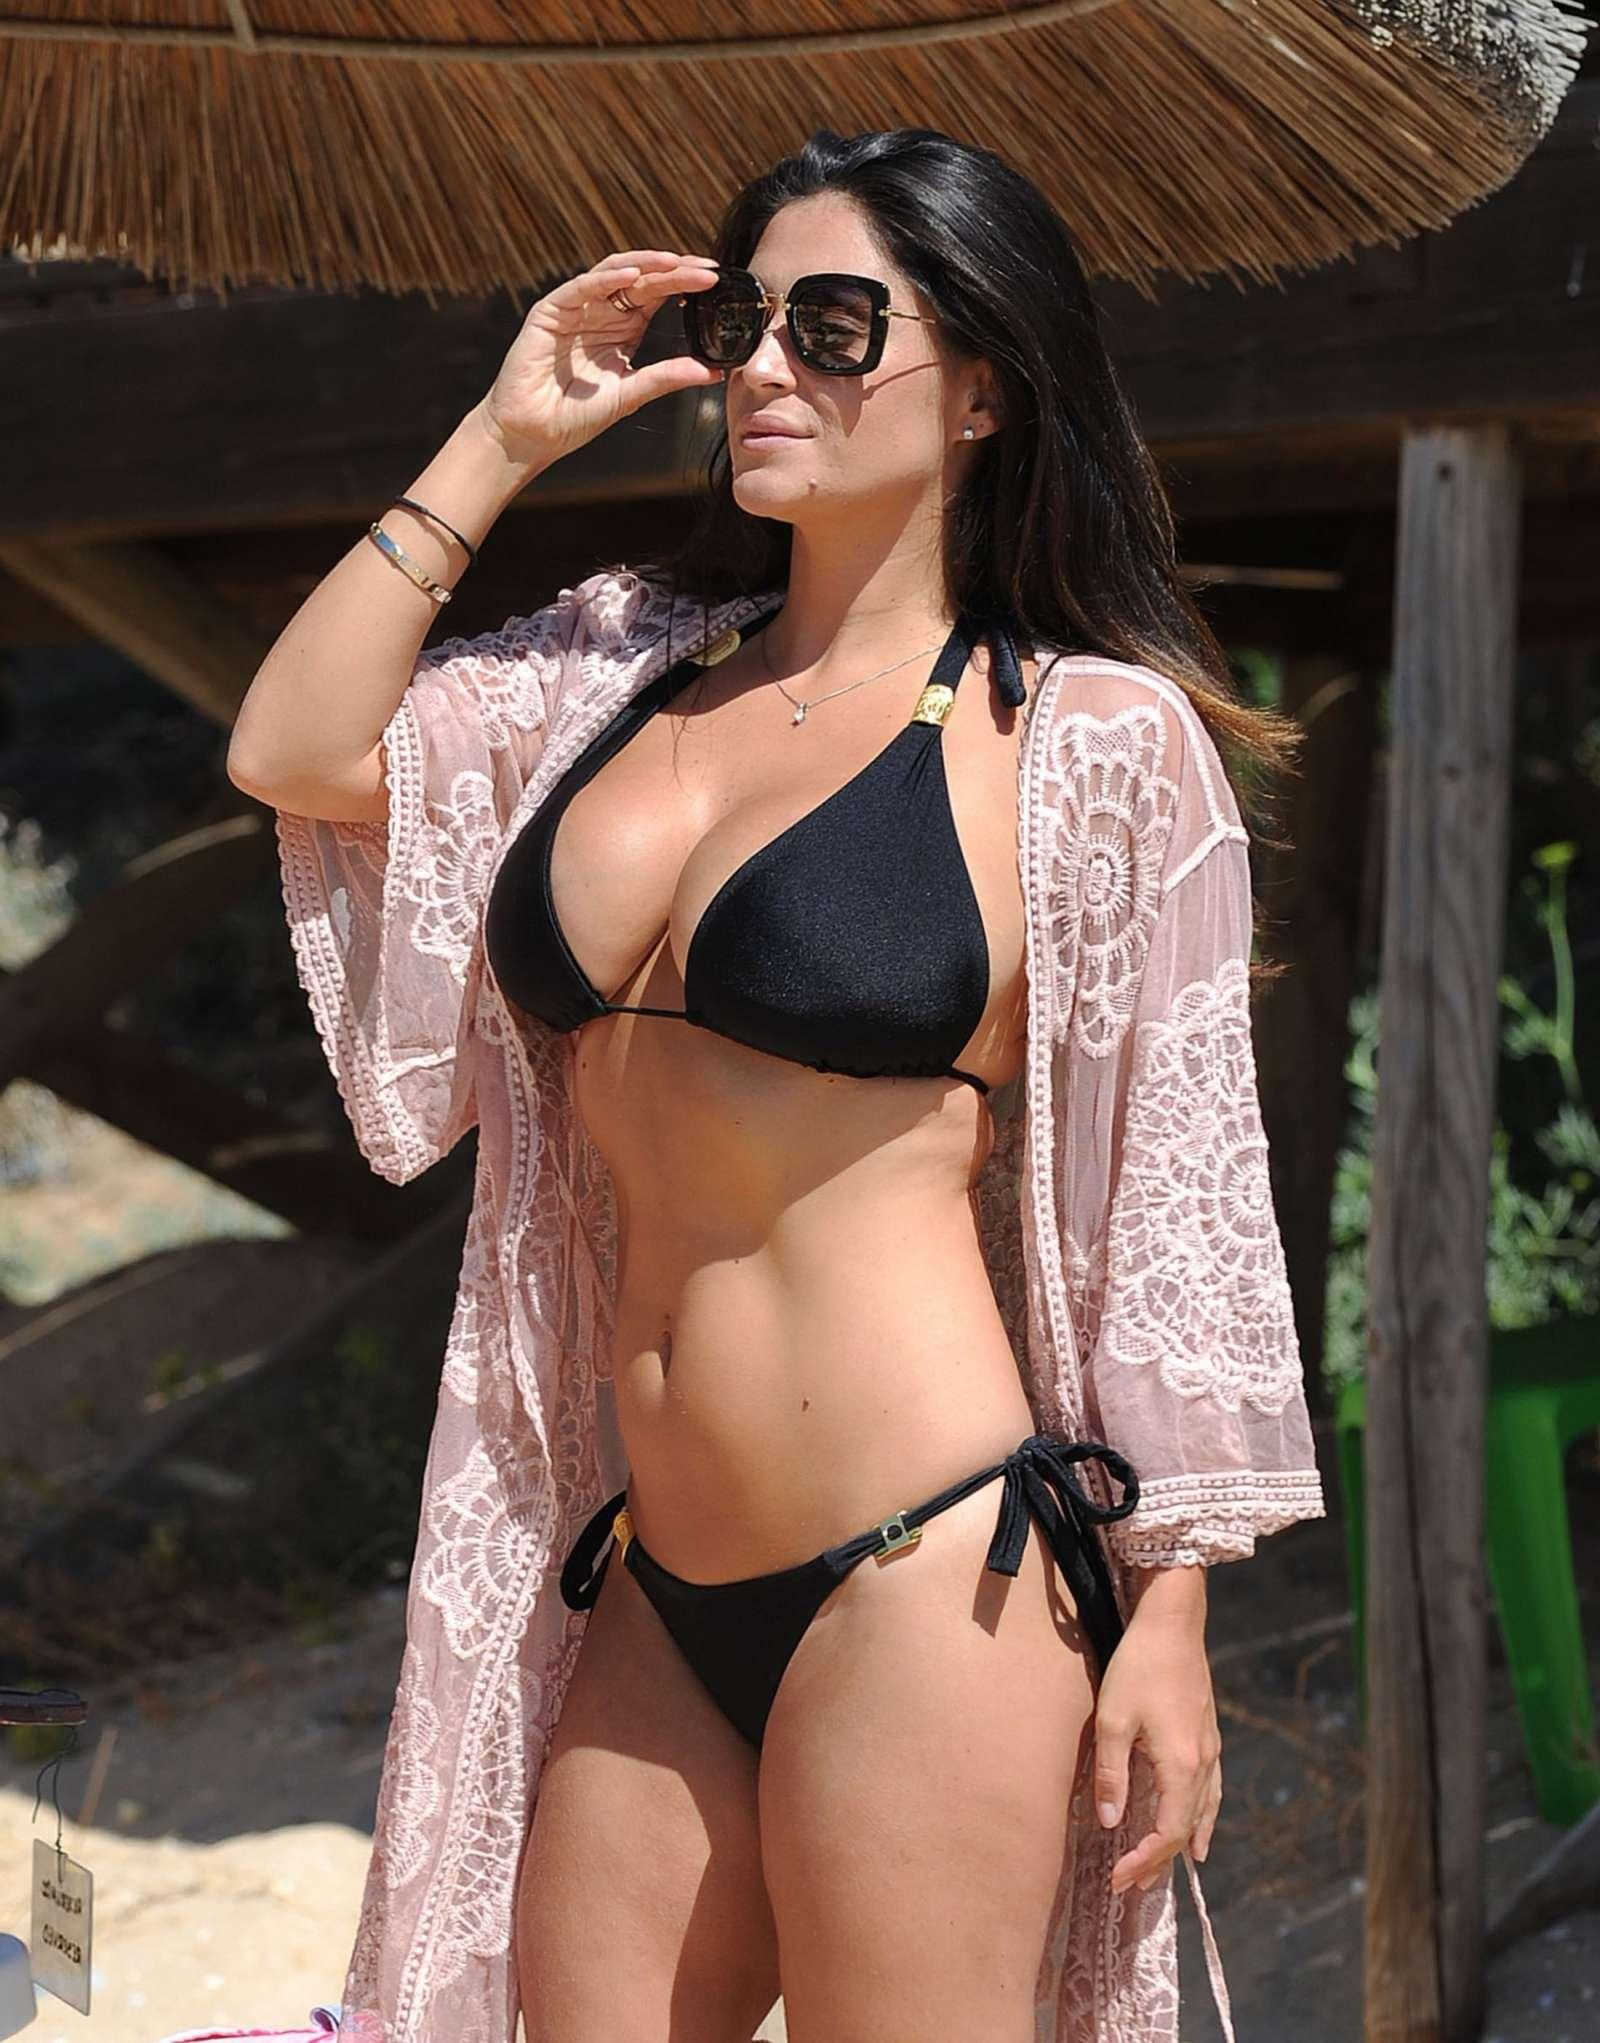 Casey Batchelor in tiny black bikini on the beach in Cyprus Pic 16 of 35